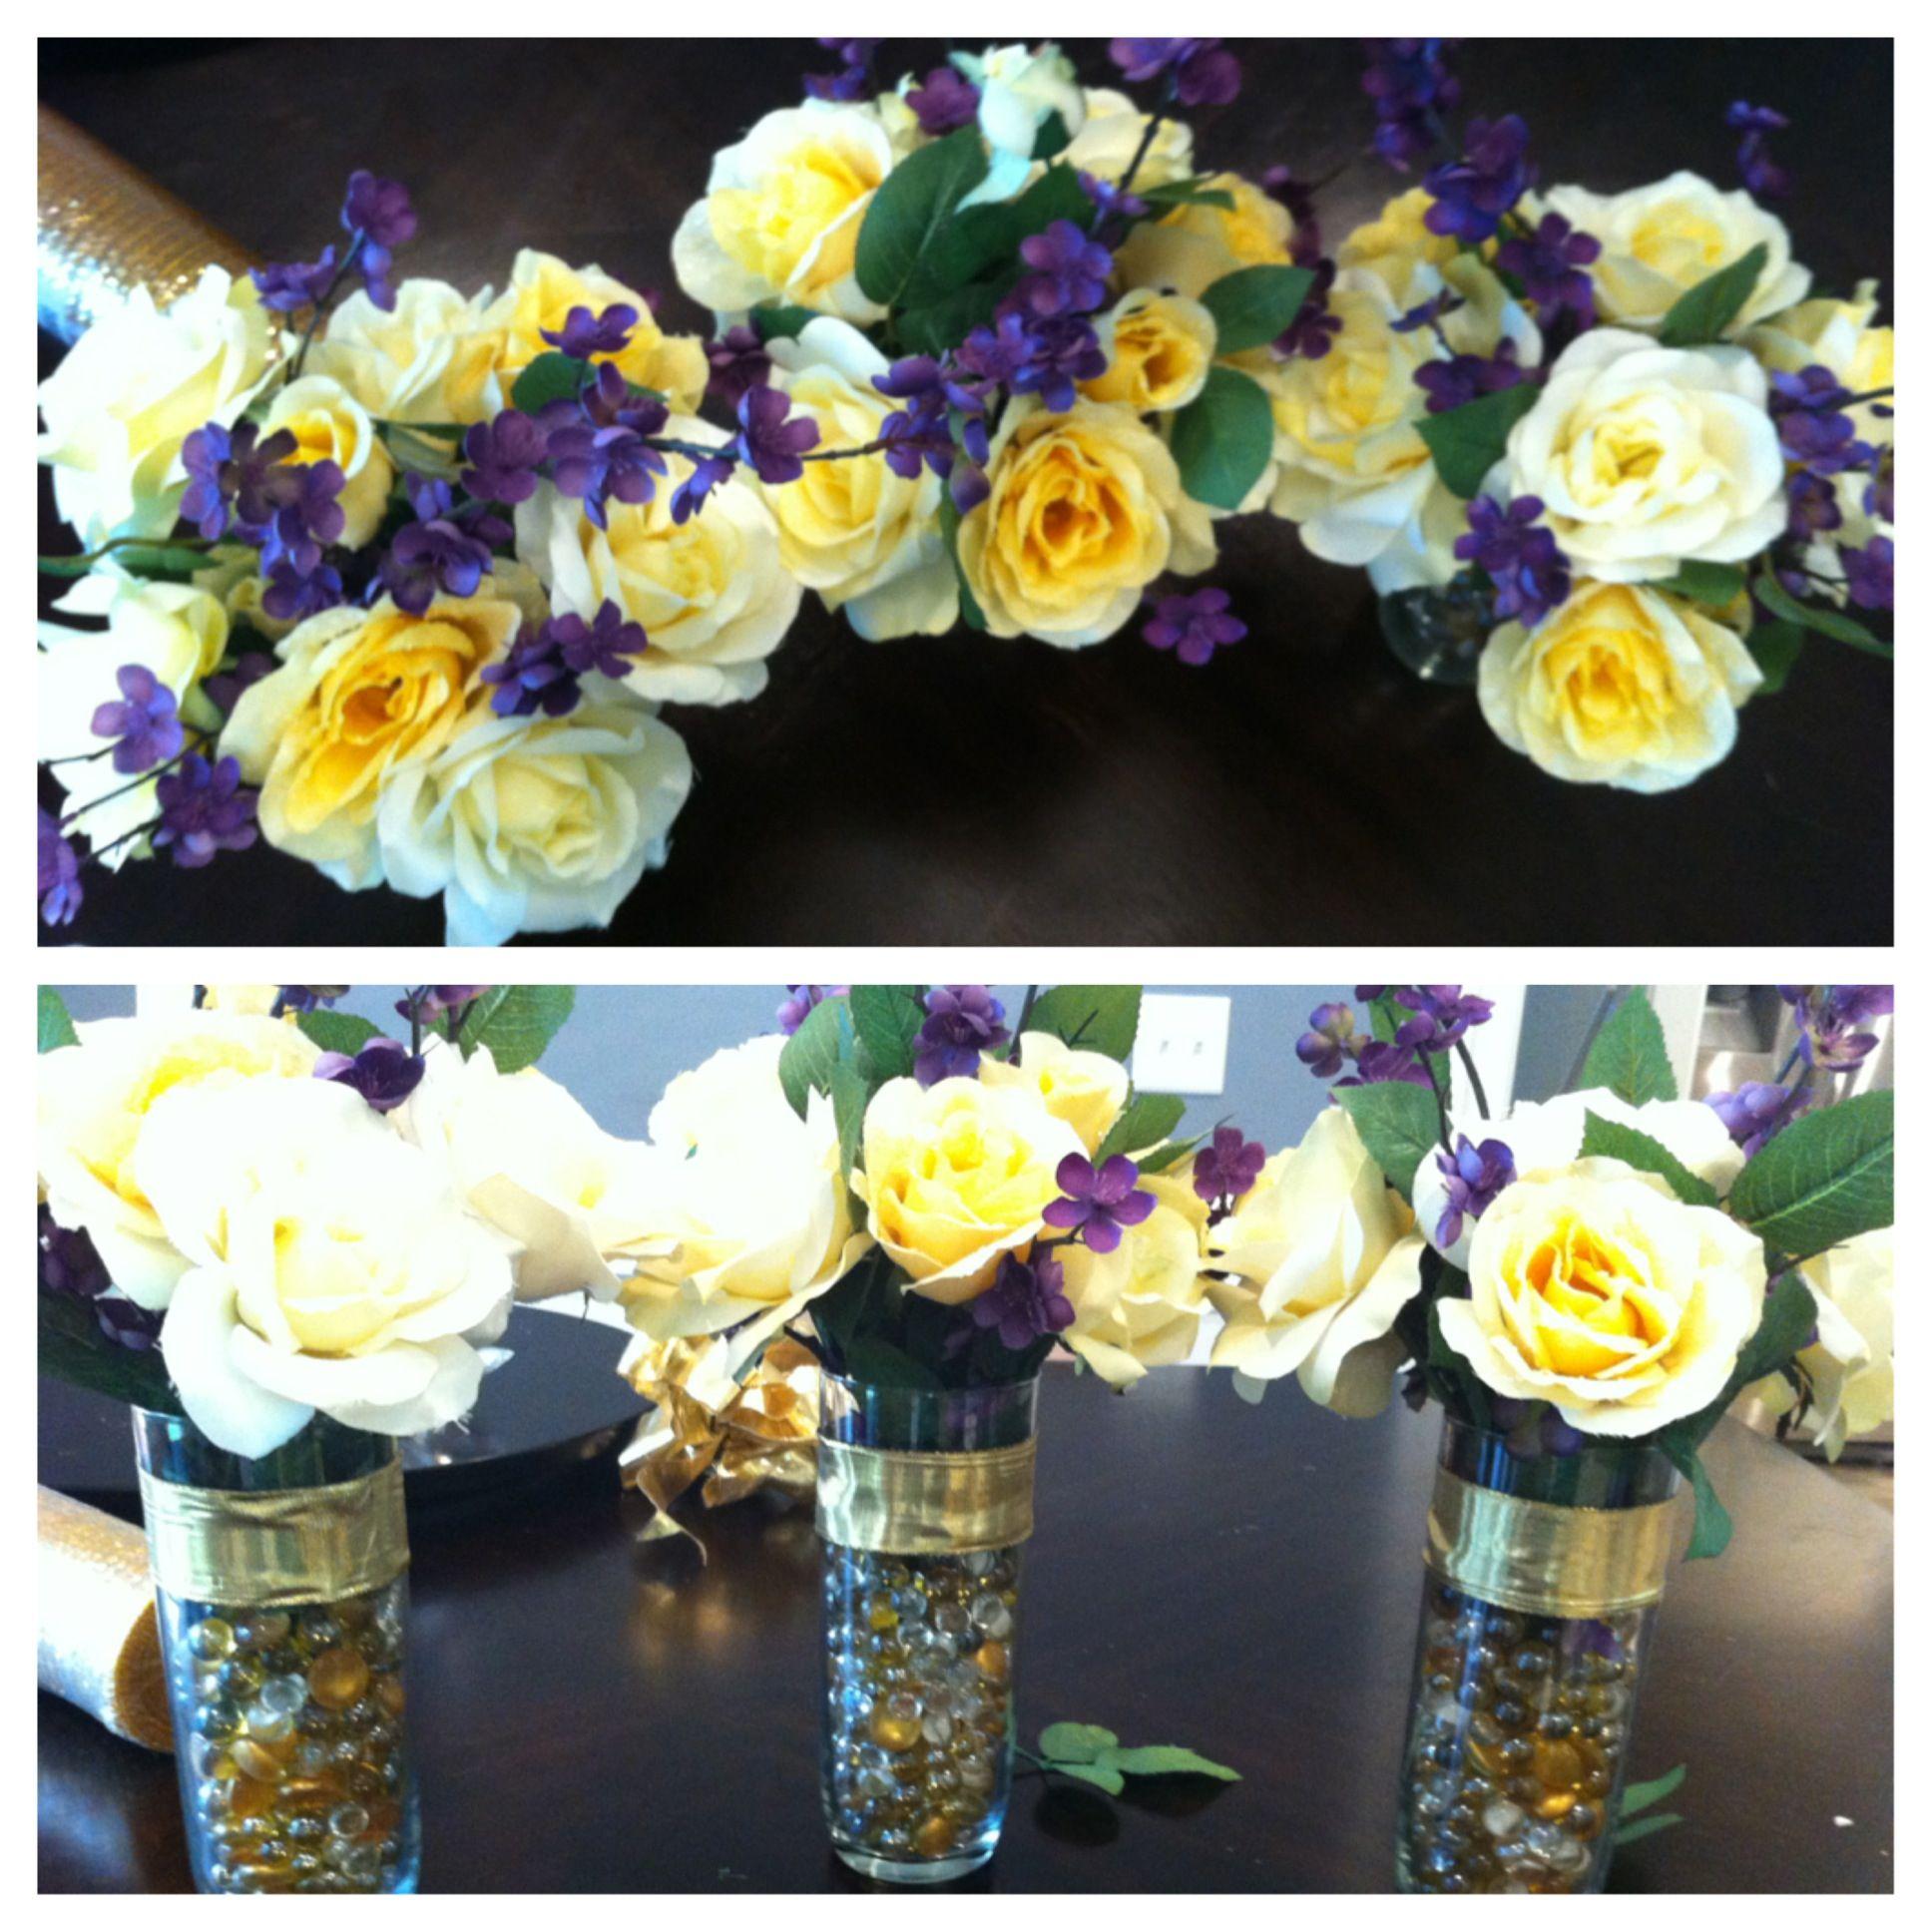 50th anniversary flower arrangement DIY diy flowers Crafty Pinterest